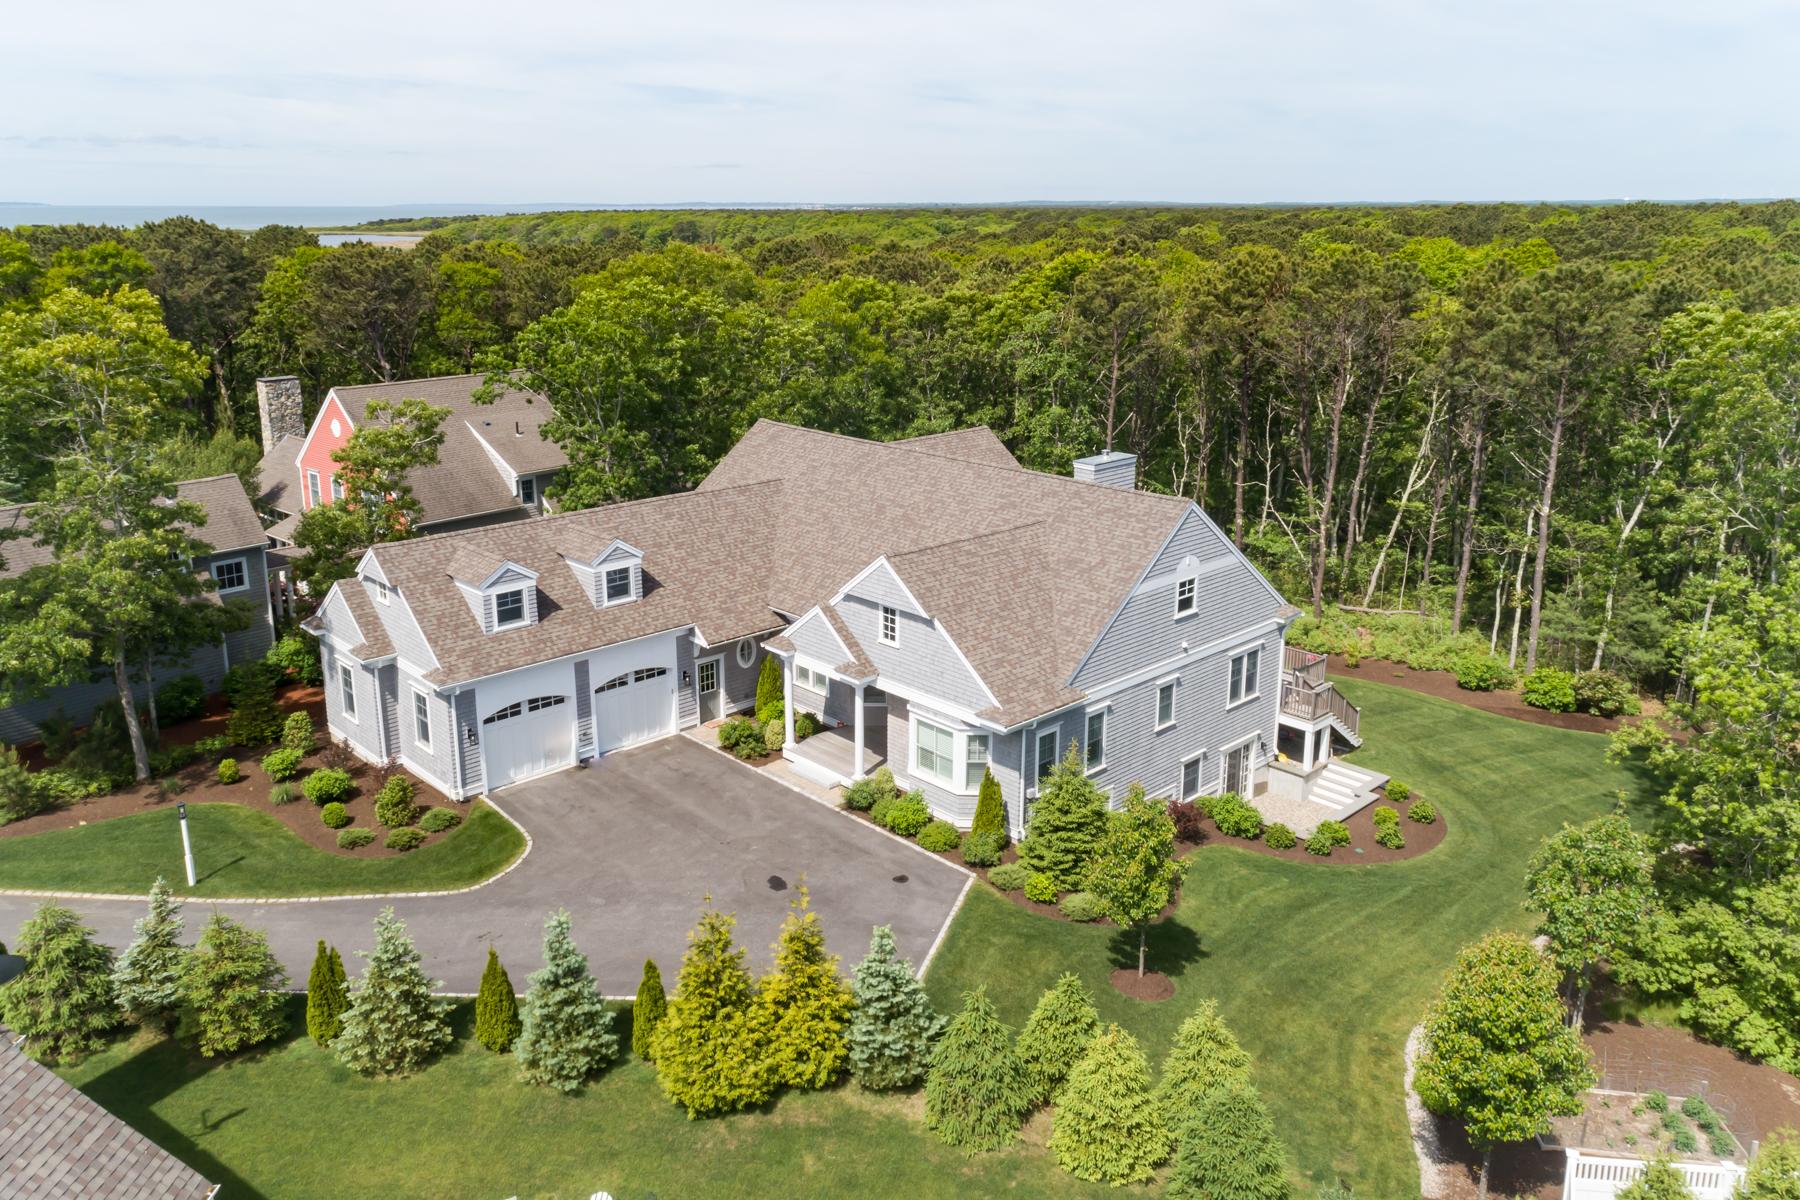 Single Family Homes por un Venta en PRESERVE AT FLAT POND CONTEMPORARY 29 Flat Pond Circle New Seabury, Massachusetts 02649 Estados Unidos